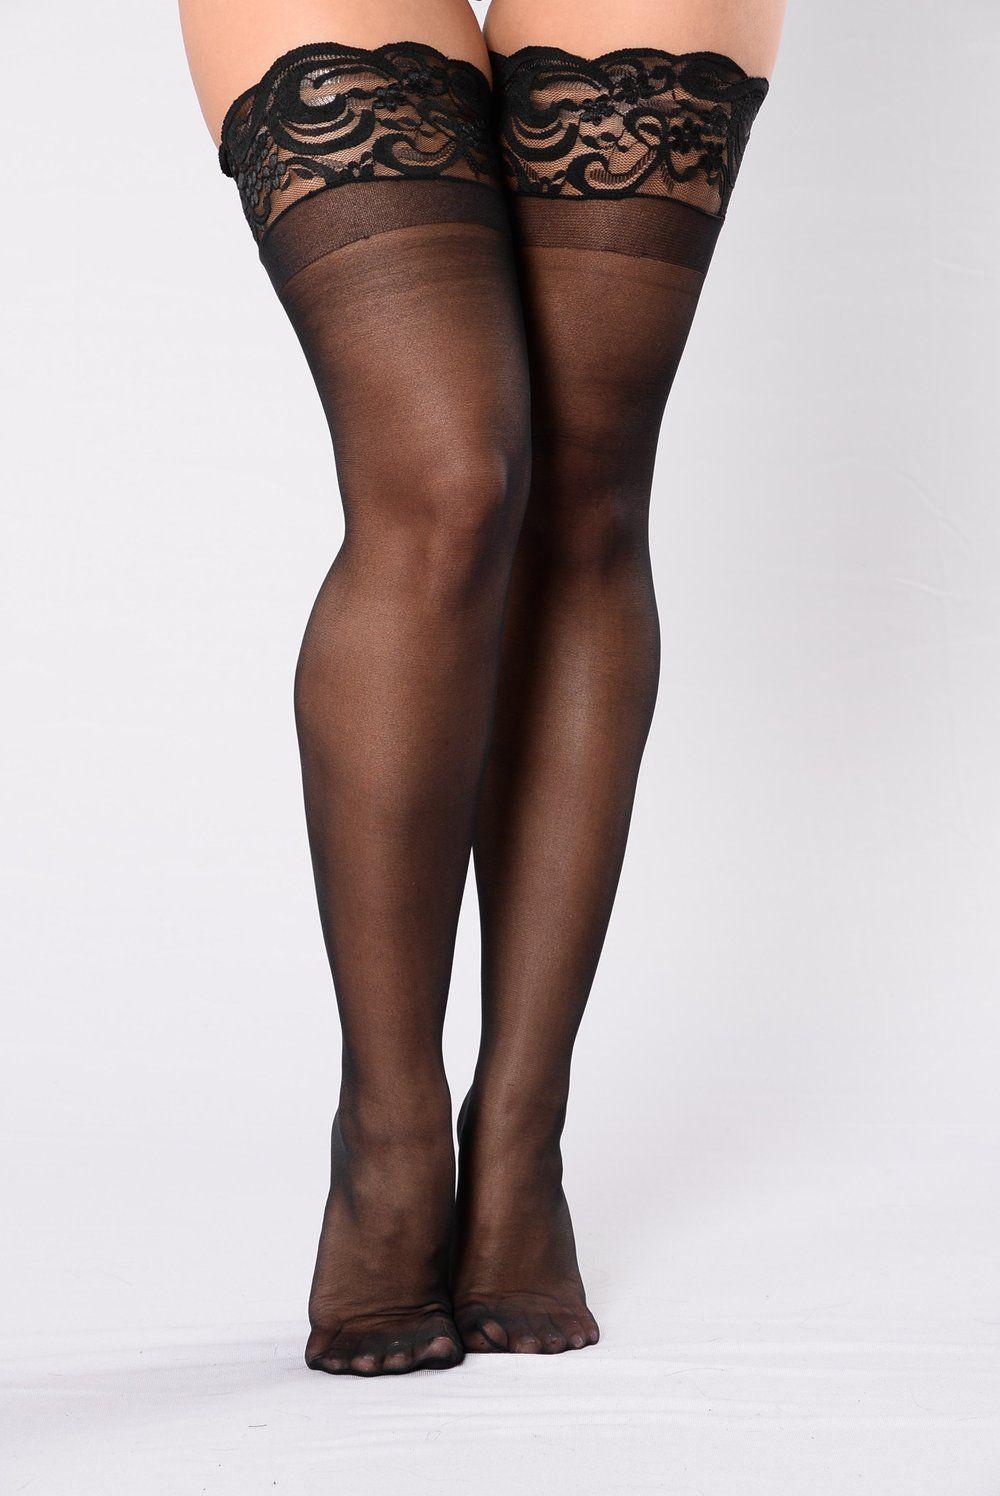 48c1b019f Sheer Thigh High Lace Top Stocking - Black